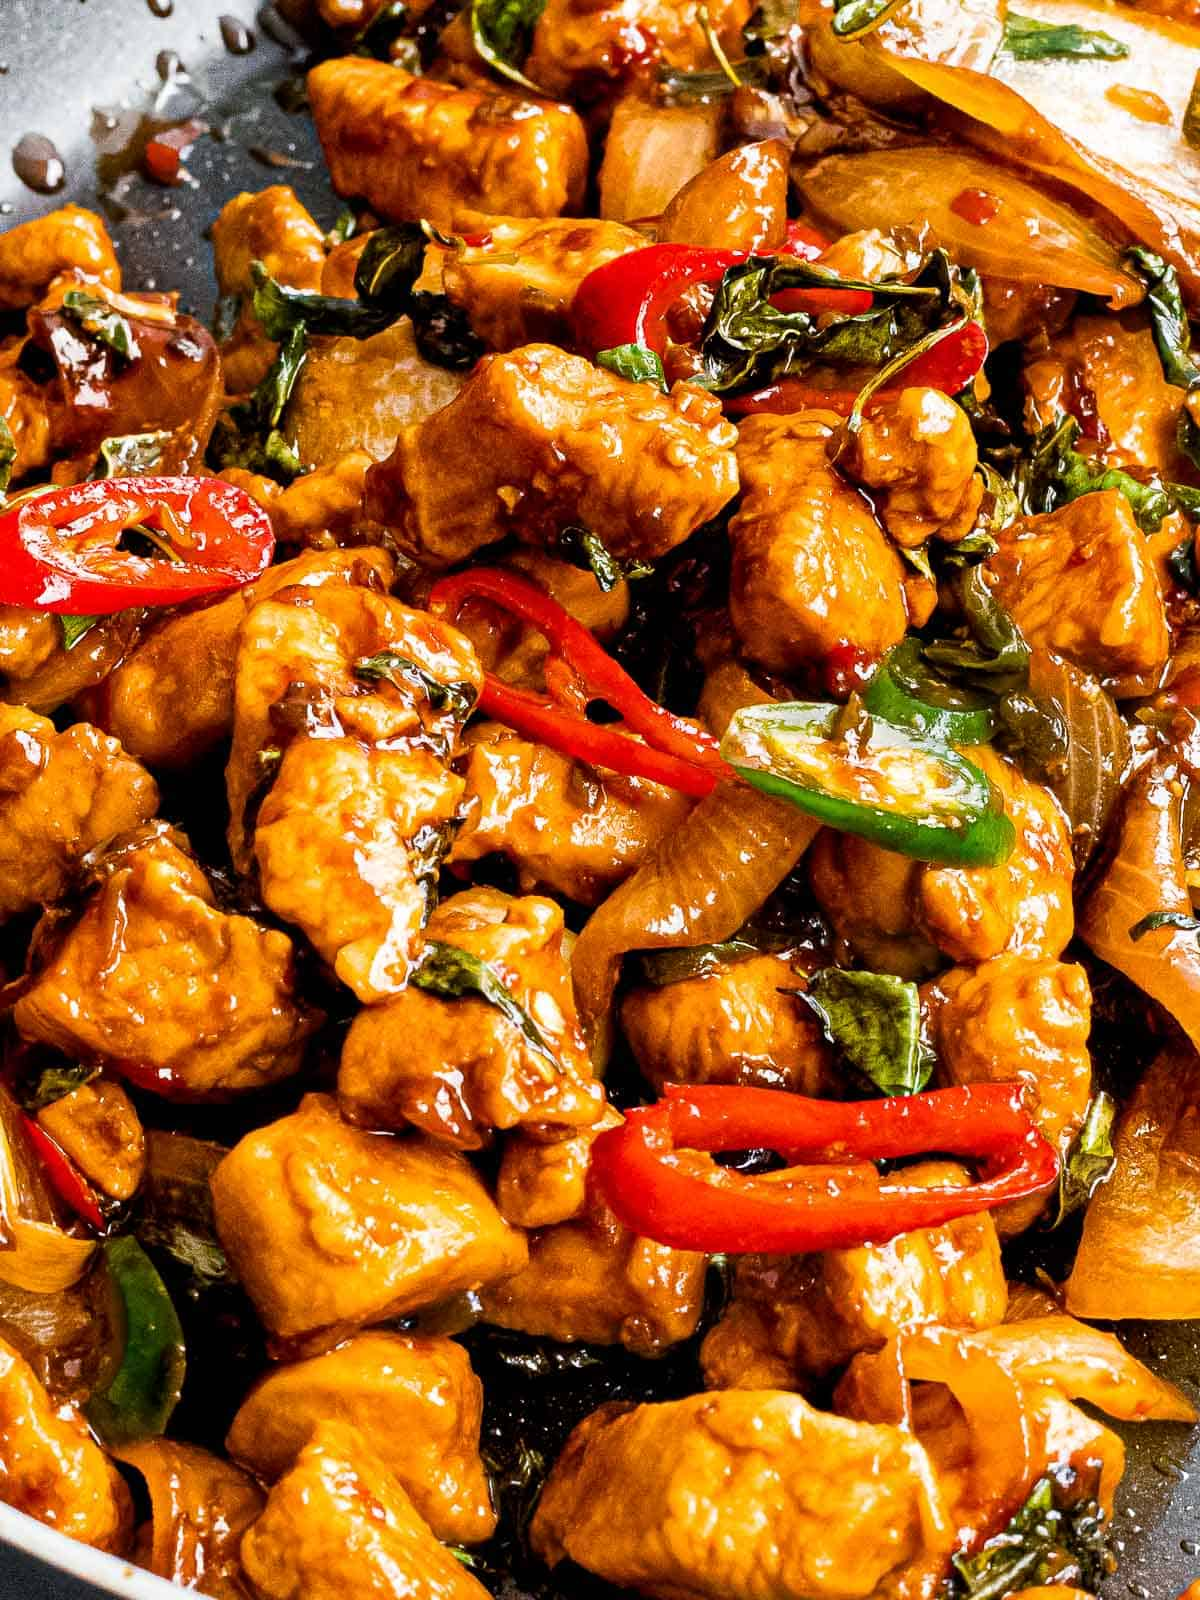 Thai basil chicken stir fry with chili pepper slices.